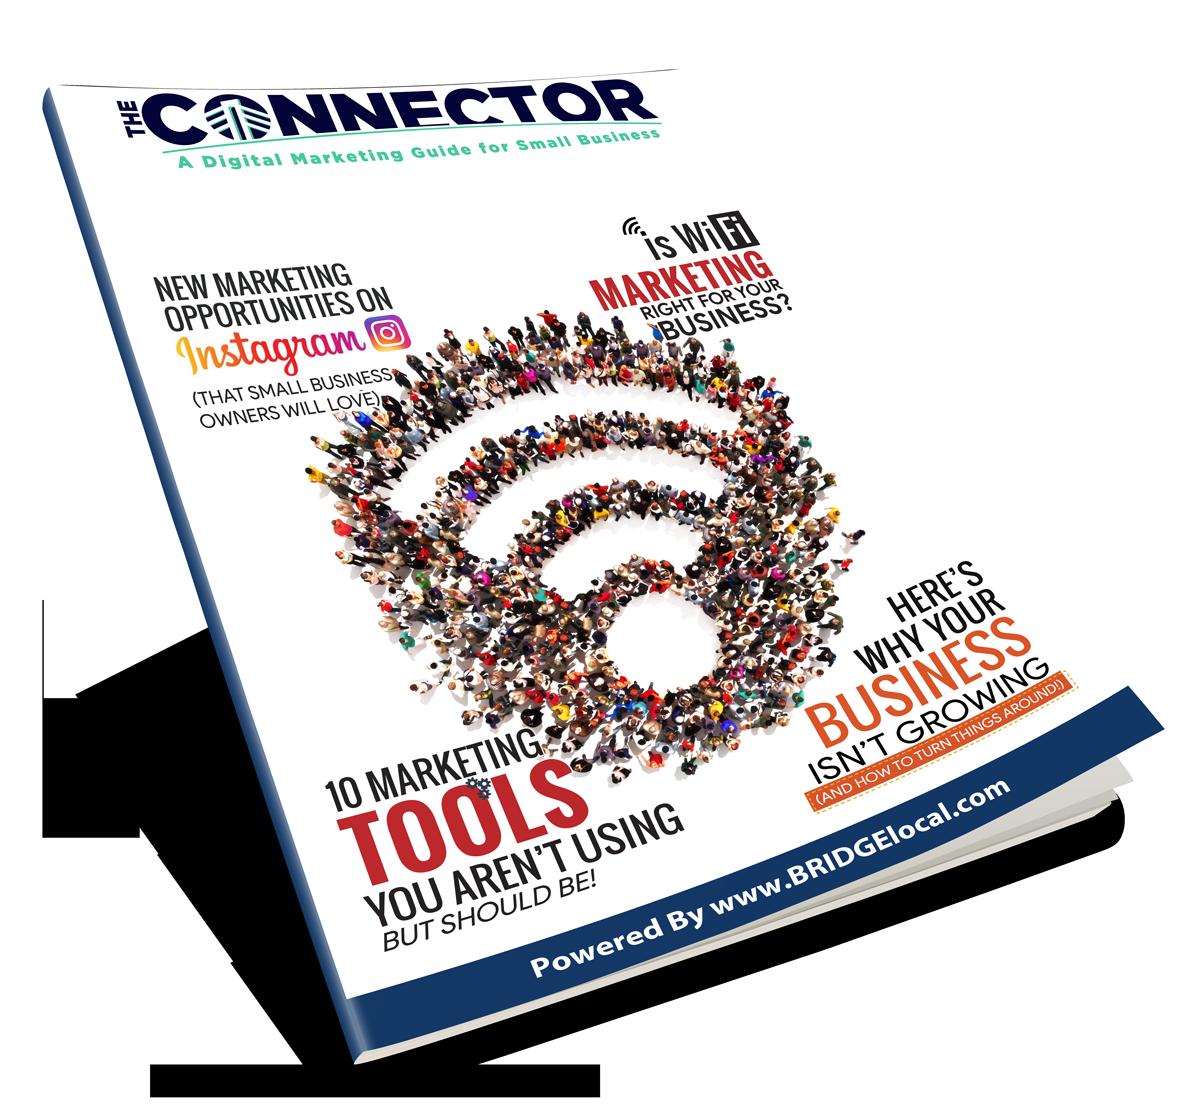 Connector-1253